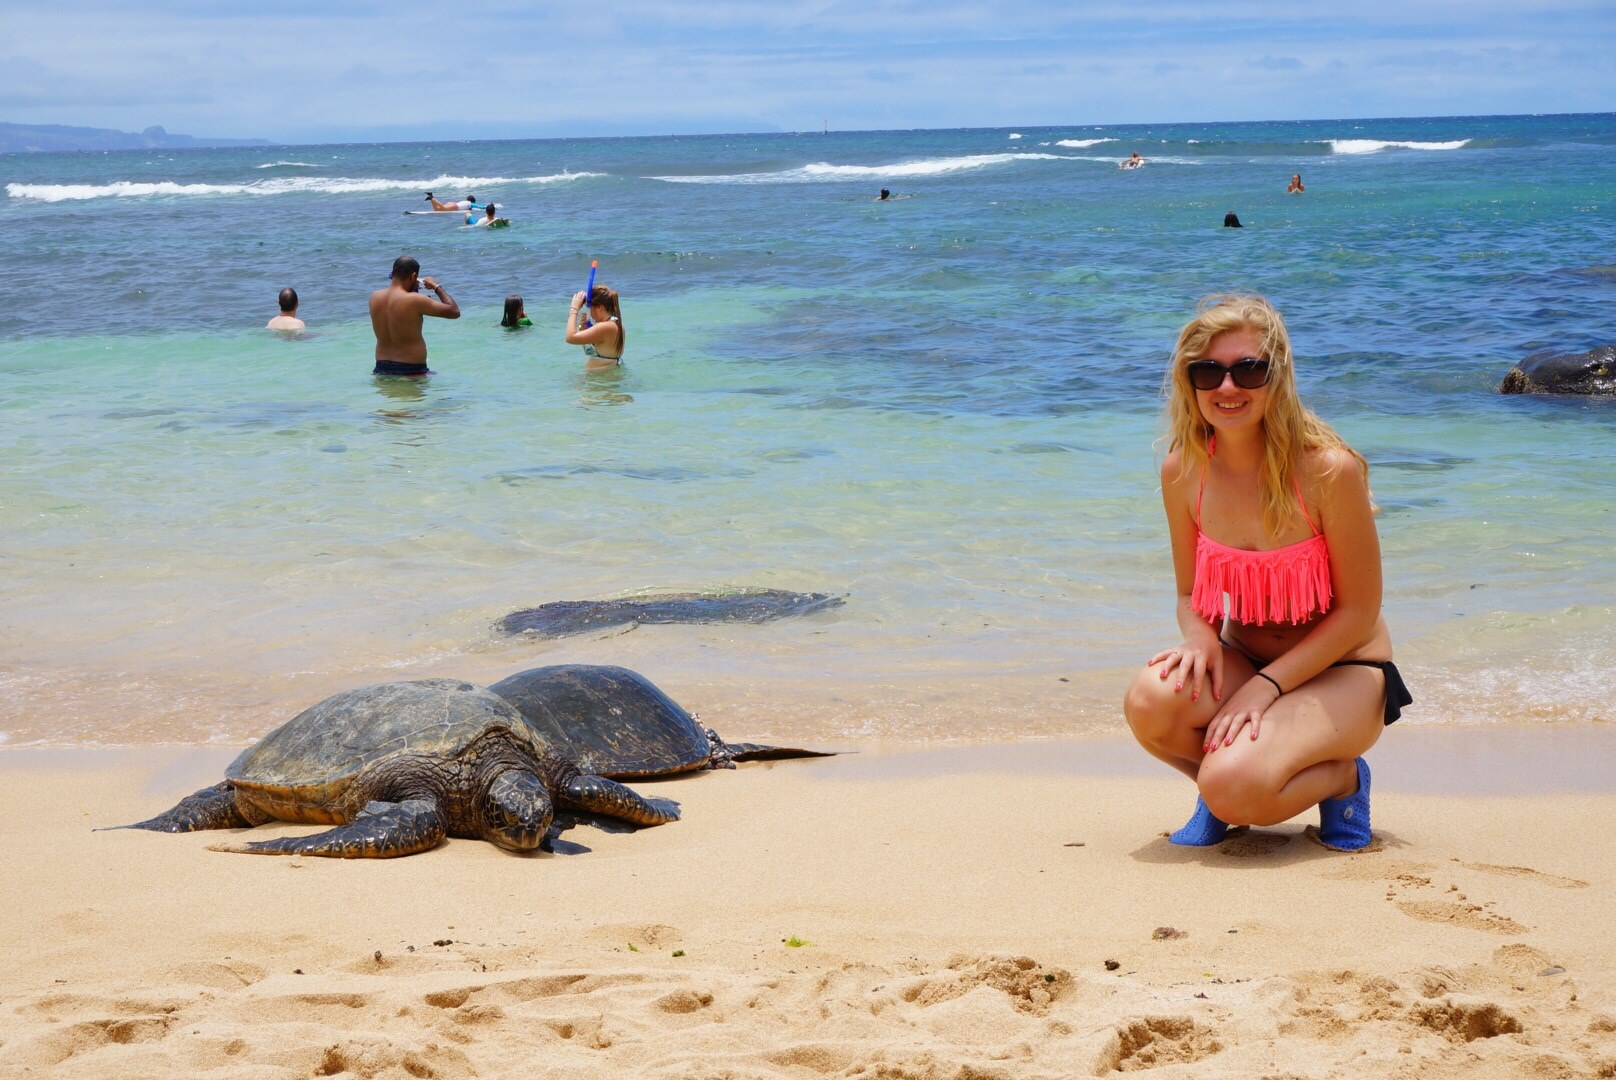 Turtle beach on Hawaii